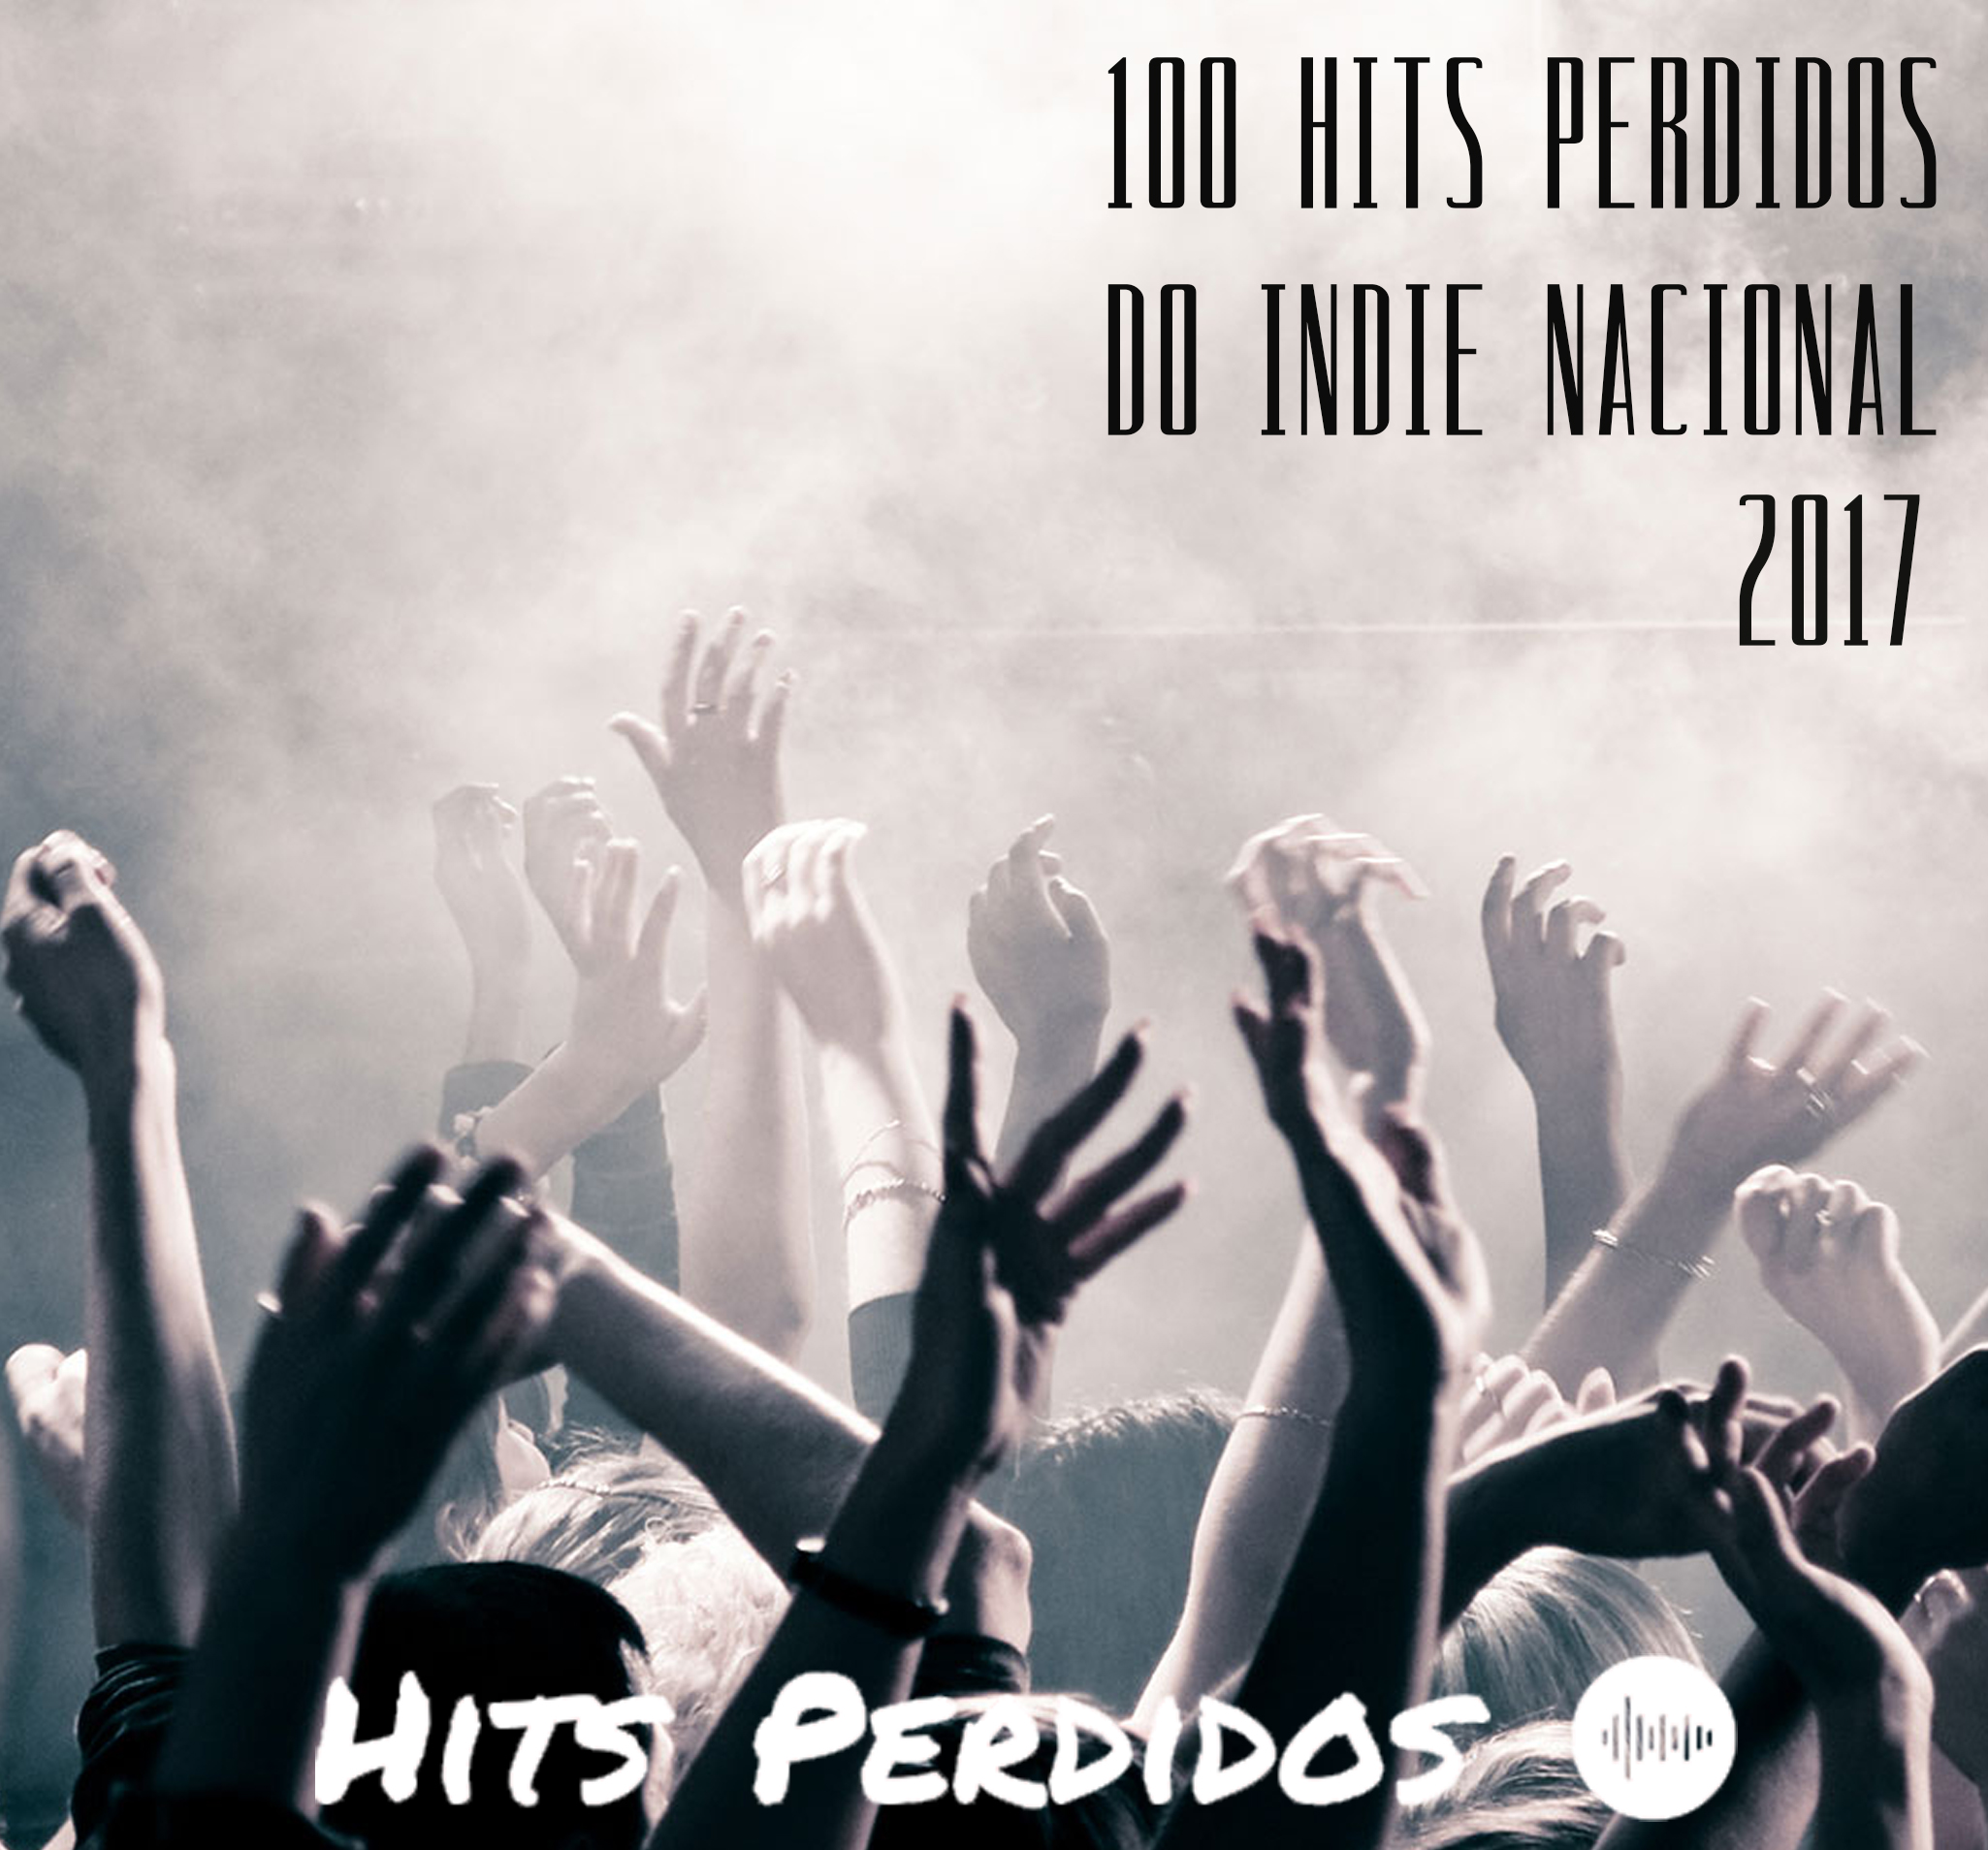 100 Hits Perdidos 2017